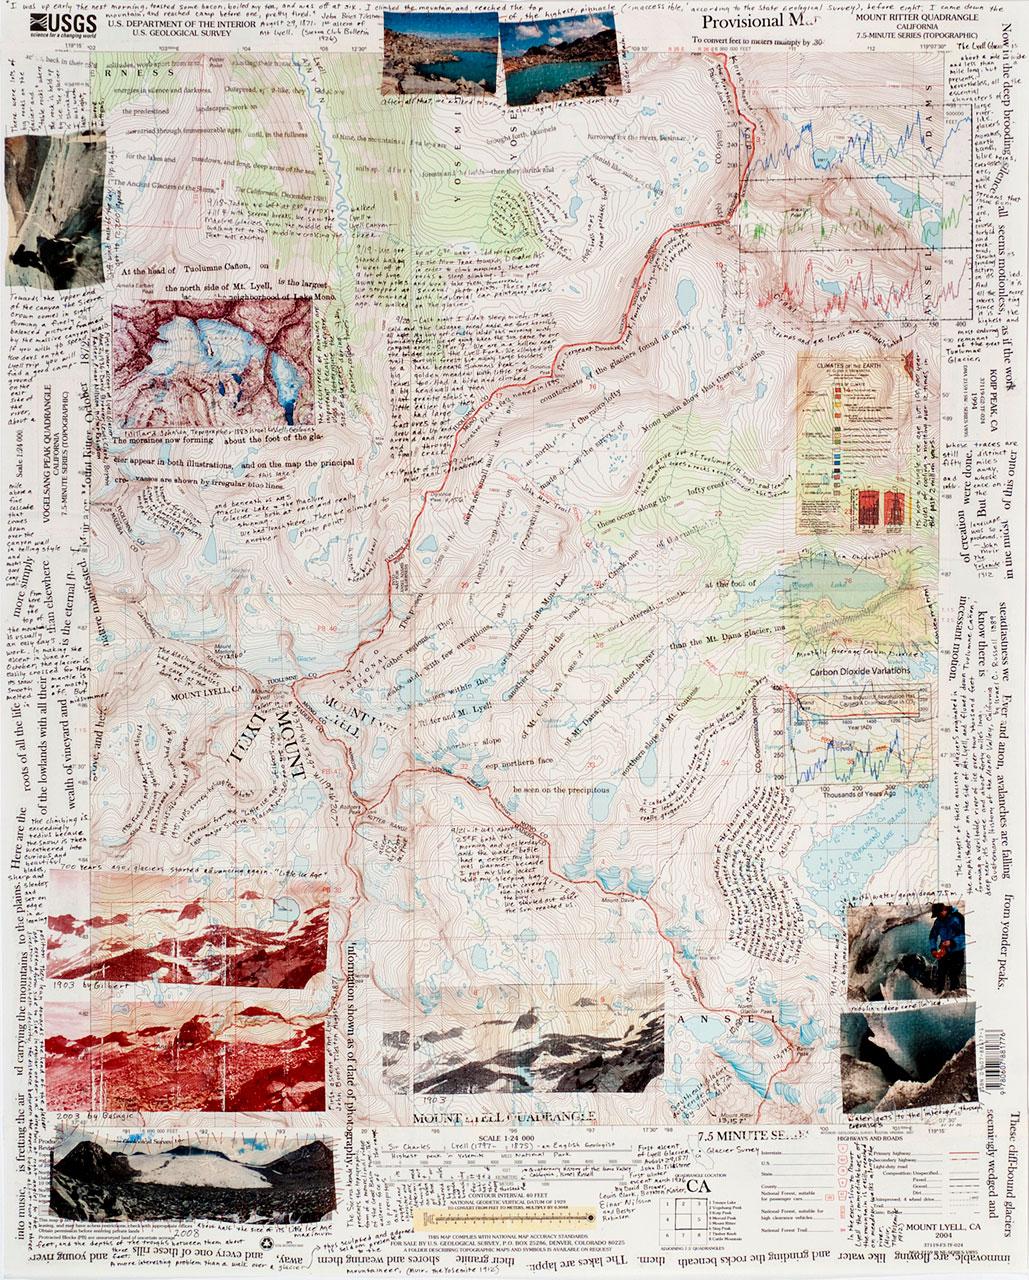 <b><i>Glacier Survey Quadrangle</b></i> Bonnie Peterson